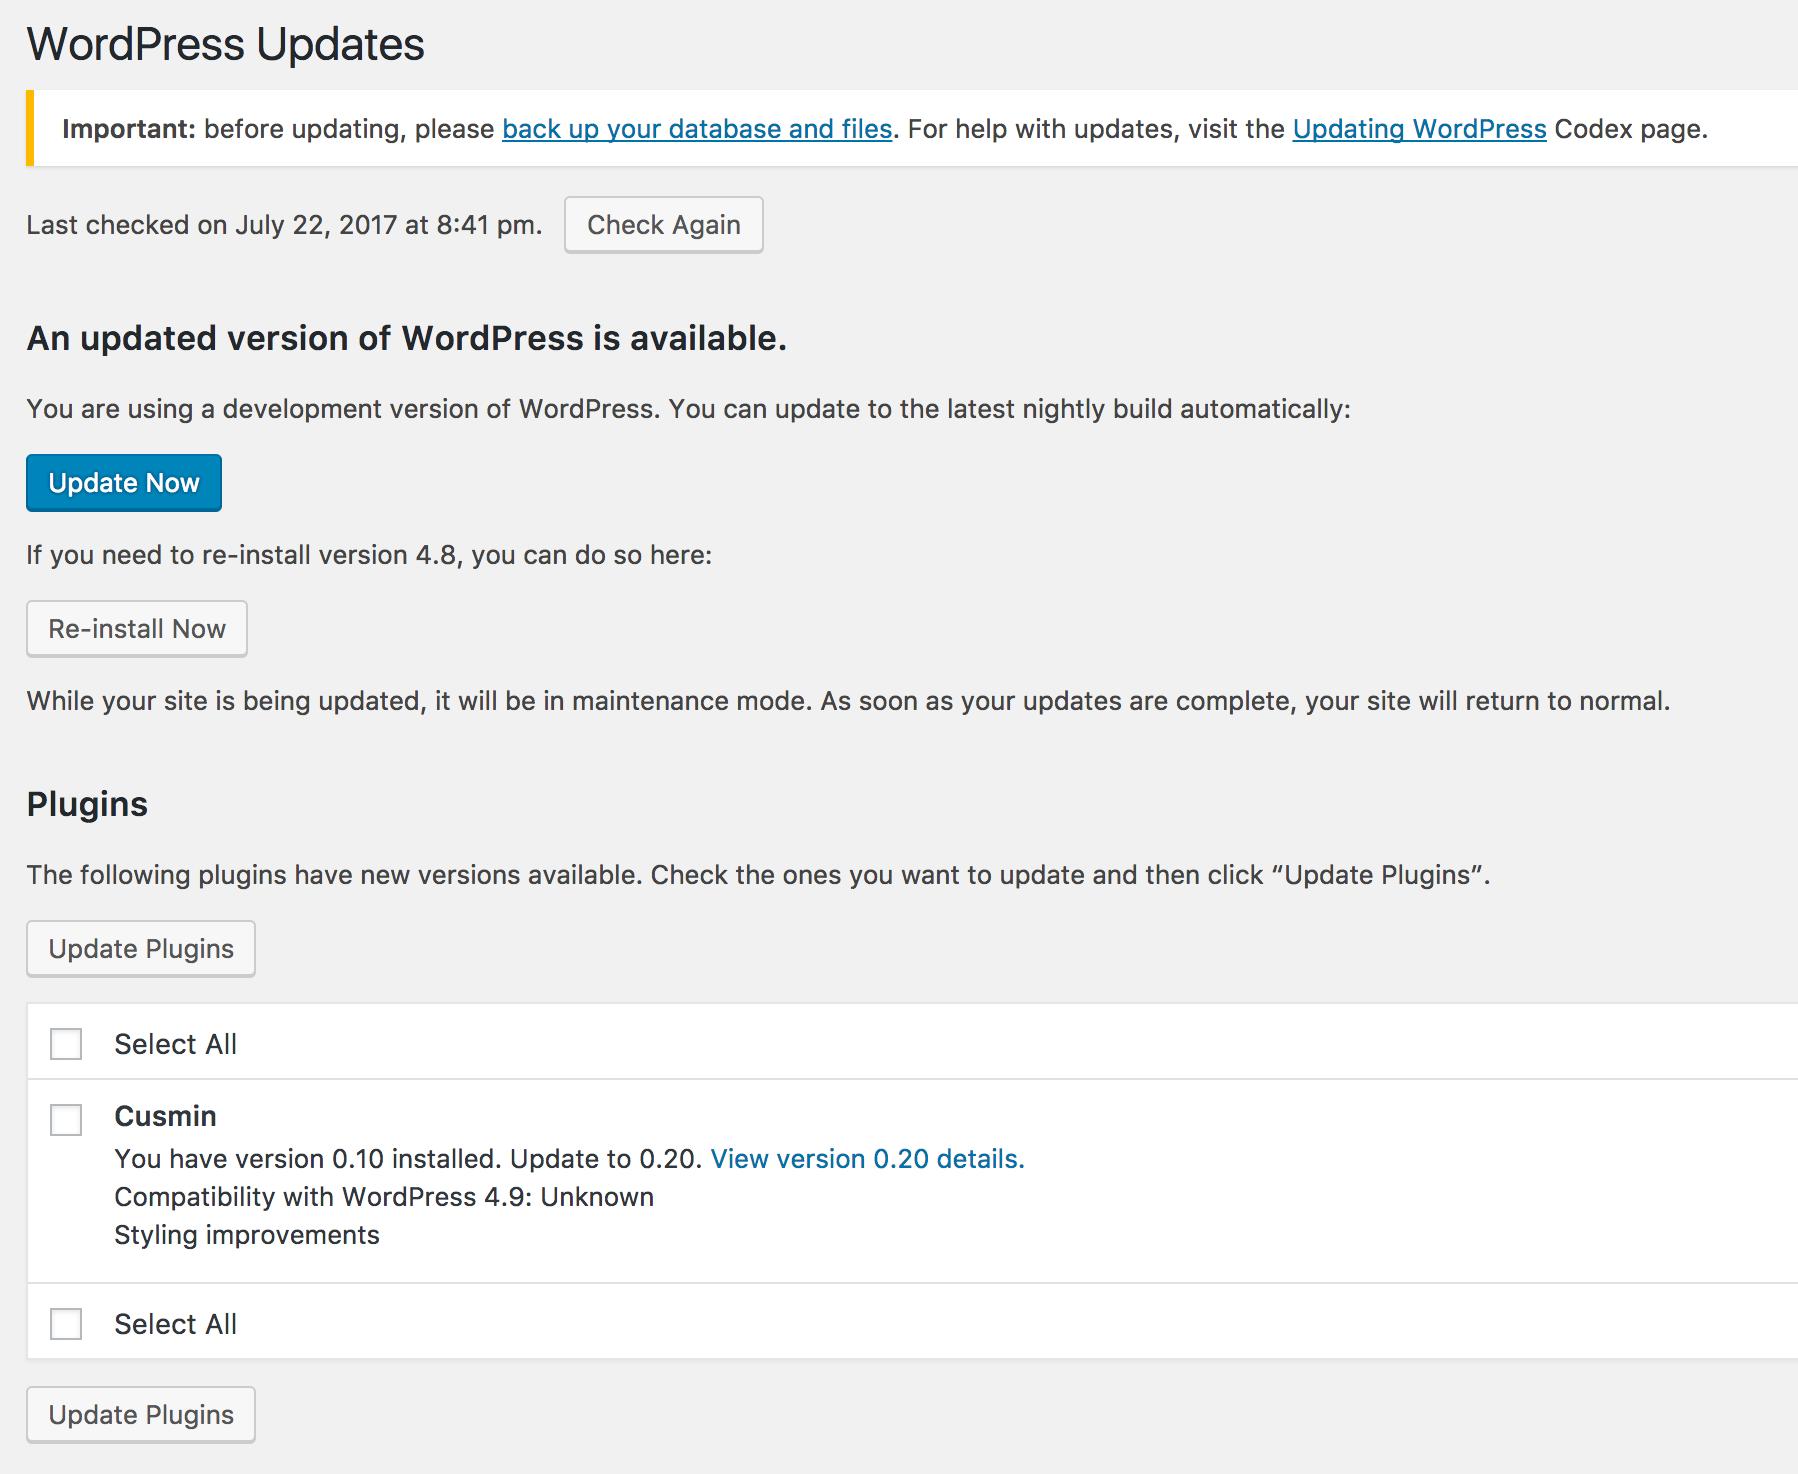 WordPress Updates page showing Cusmin update option